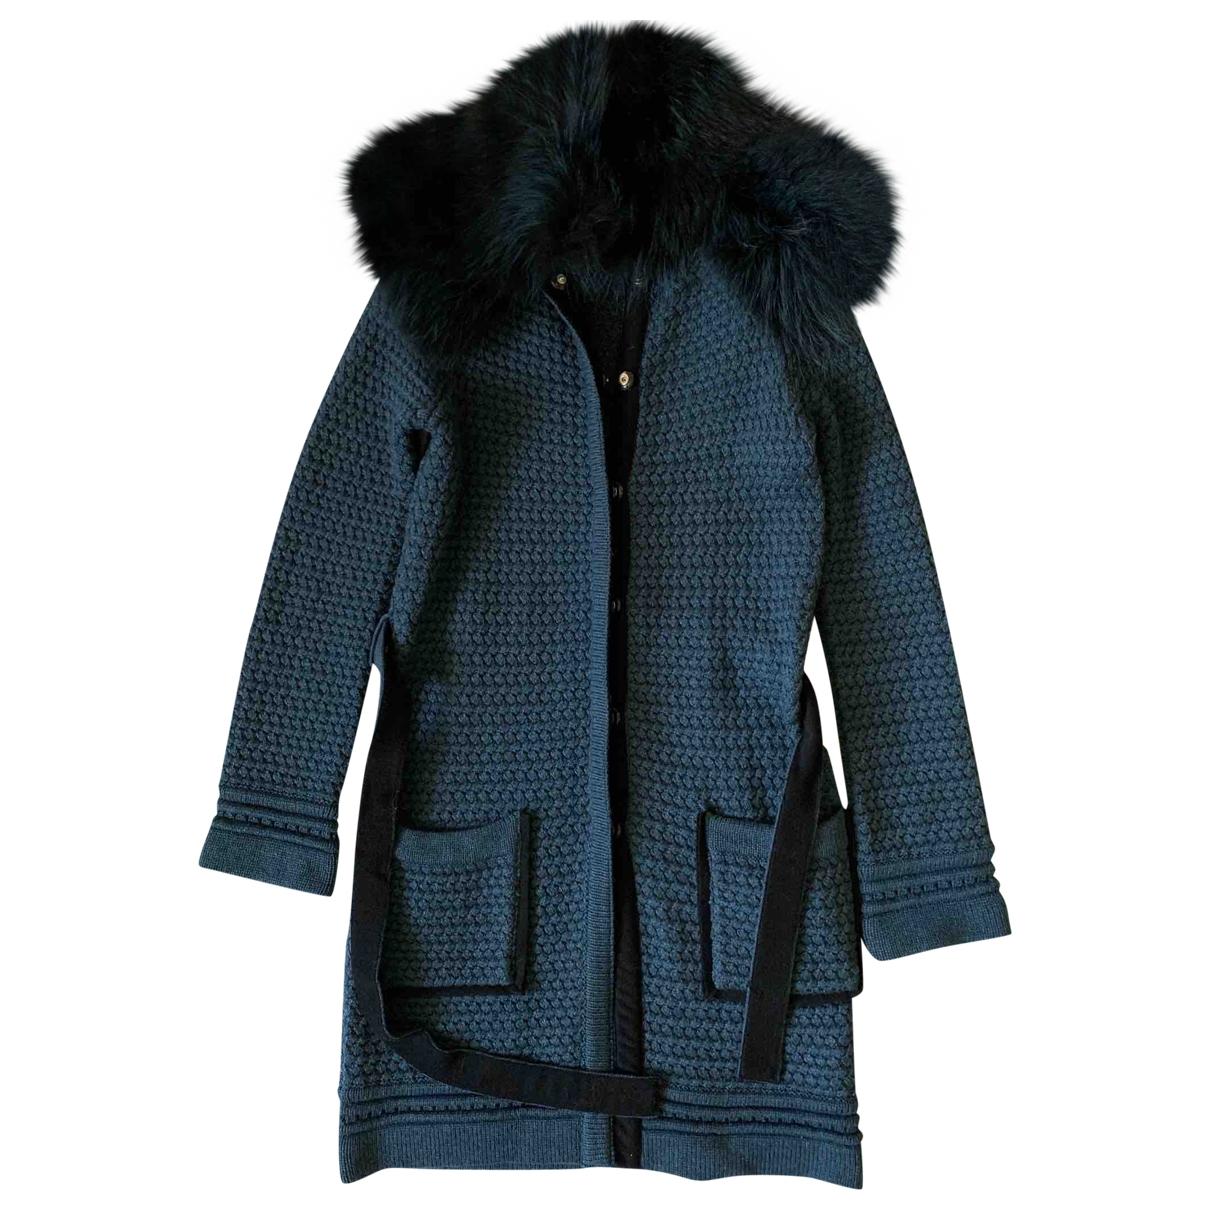 Roberto Cavalli \N Turquoise Wool coat for Women 38 IT